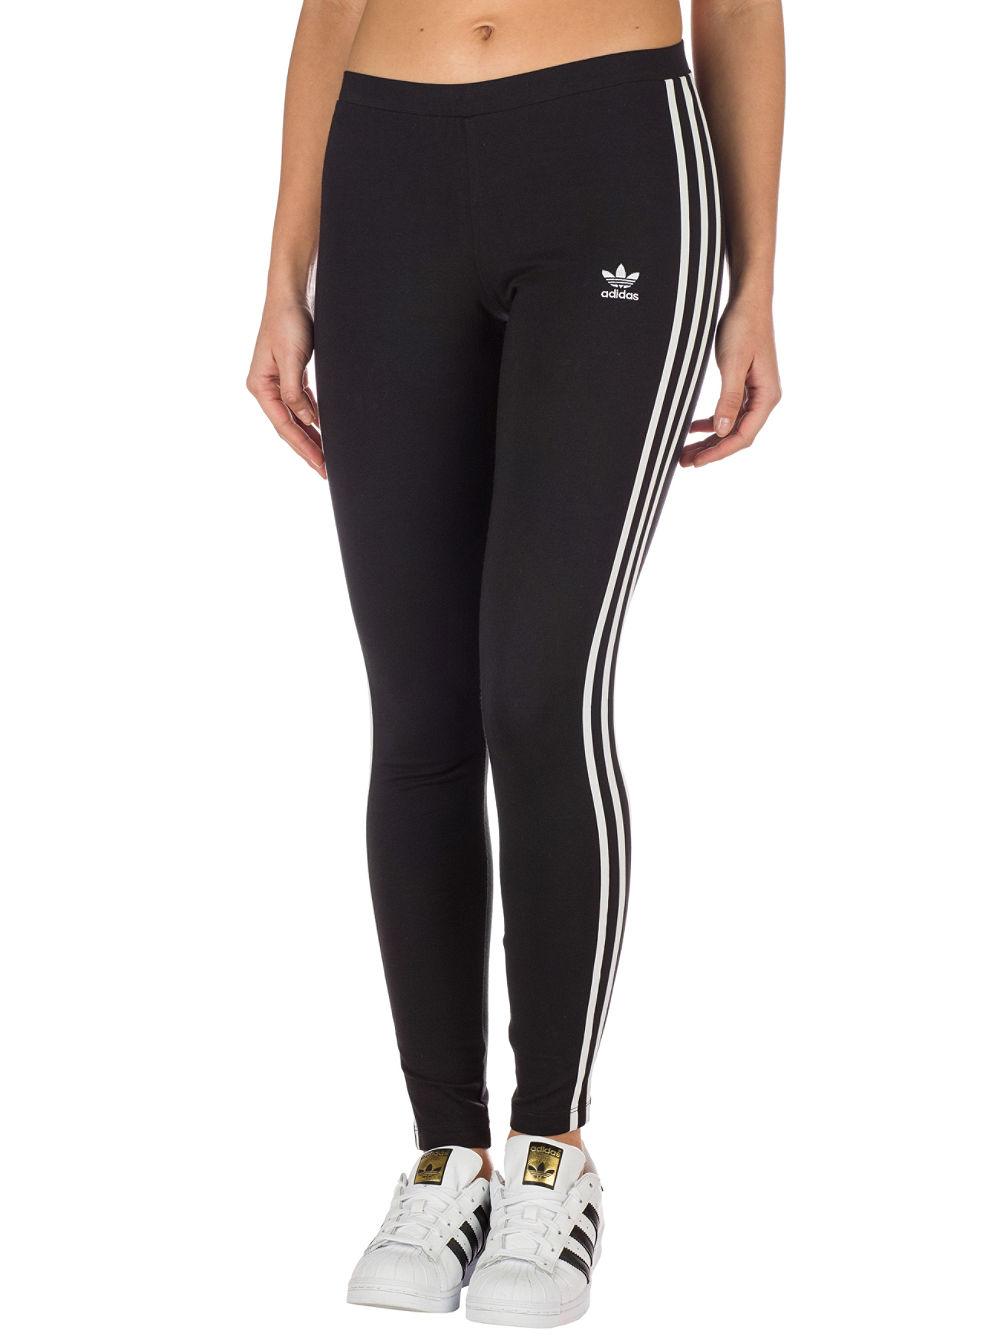 d42f092e Buy adidas Originals 3 Stripes Tight Leggings online at Blue Tomato